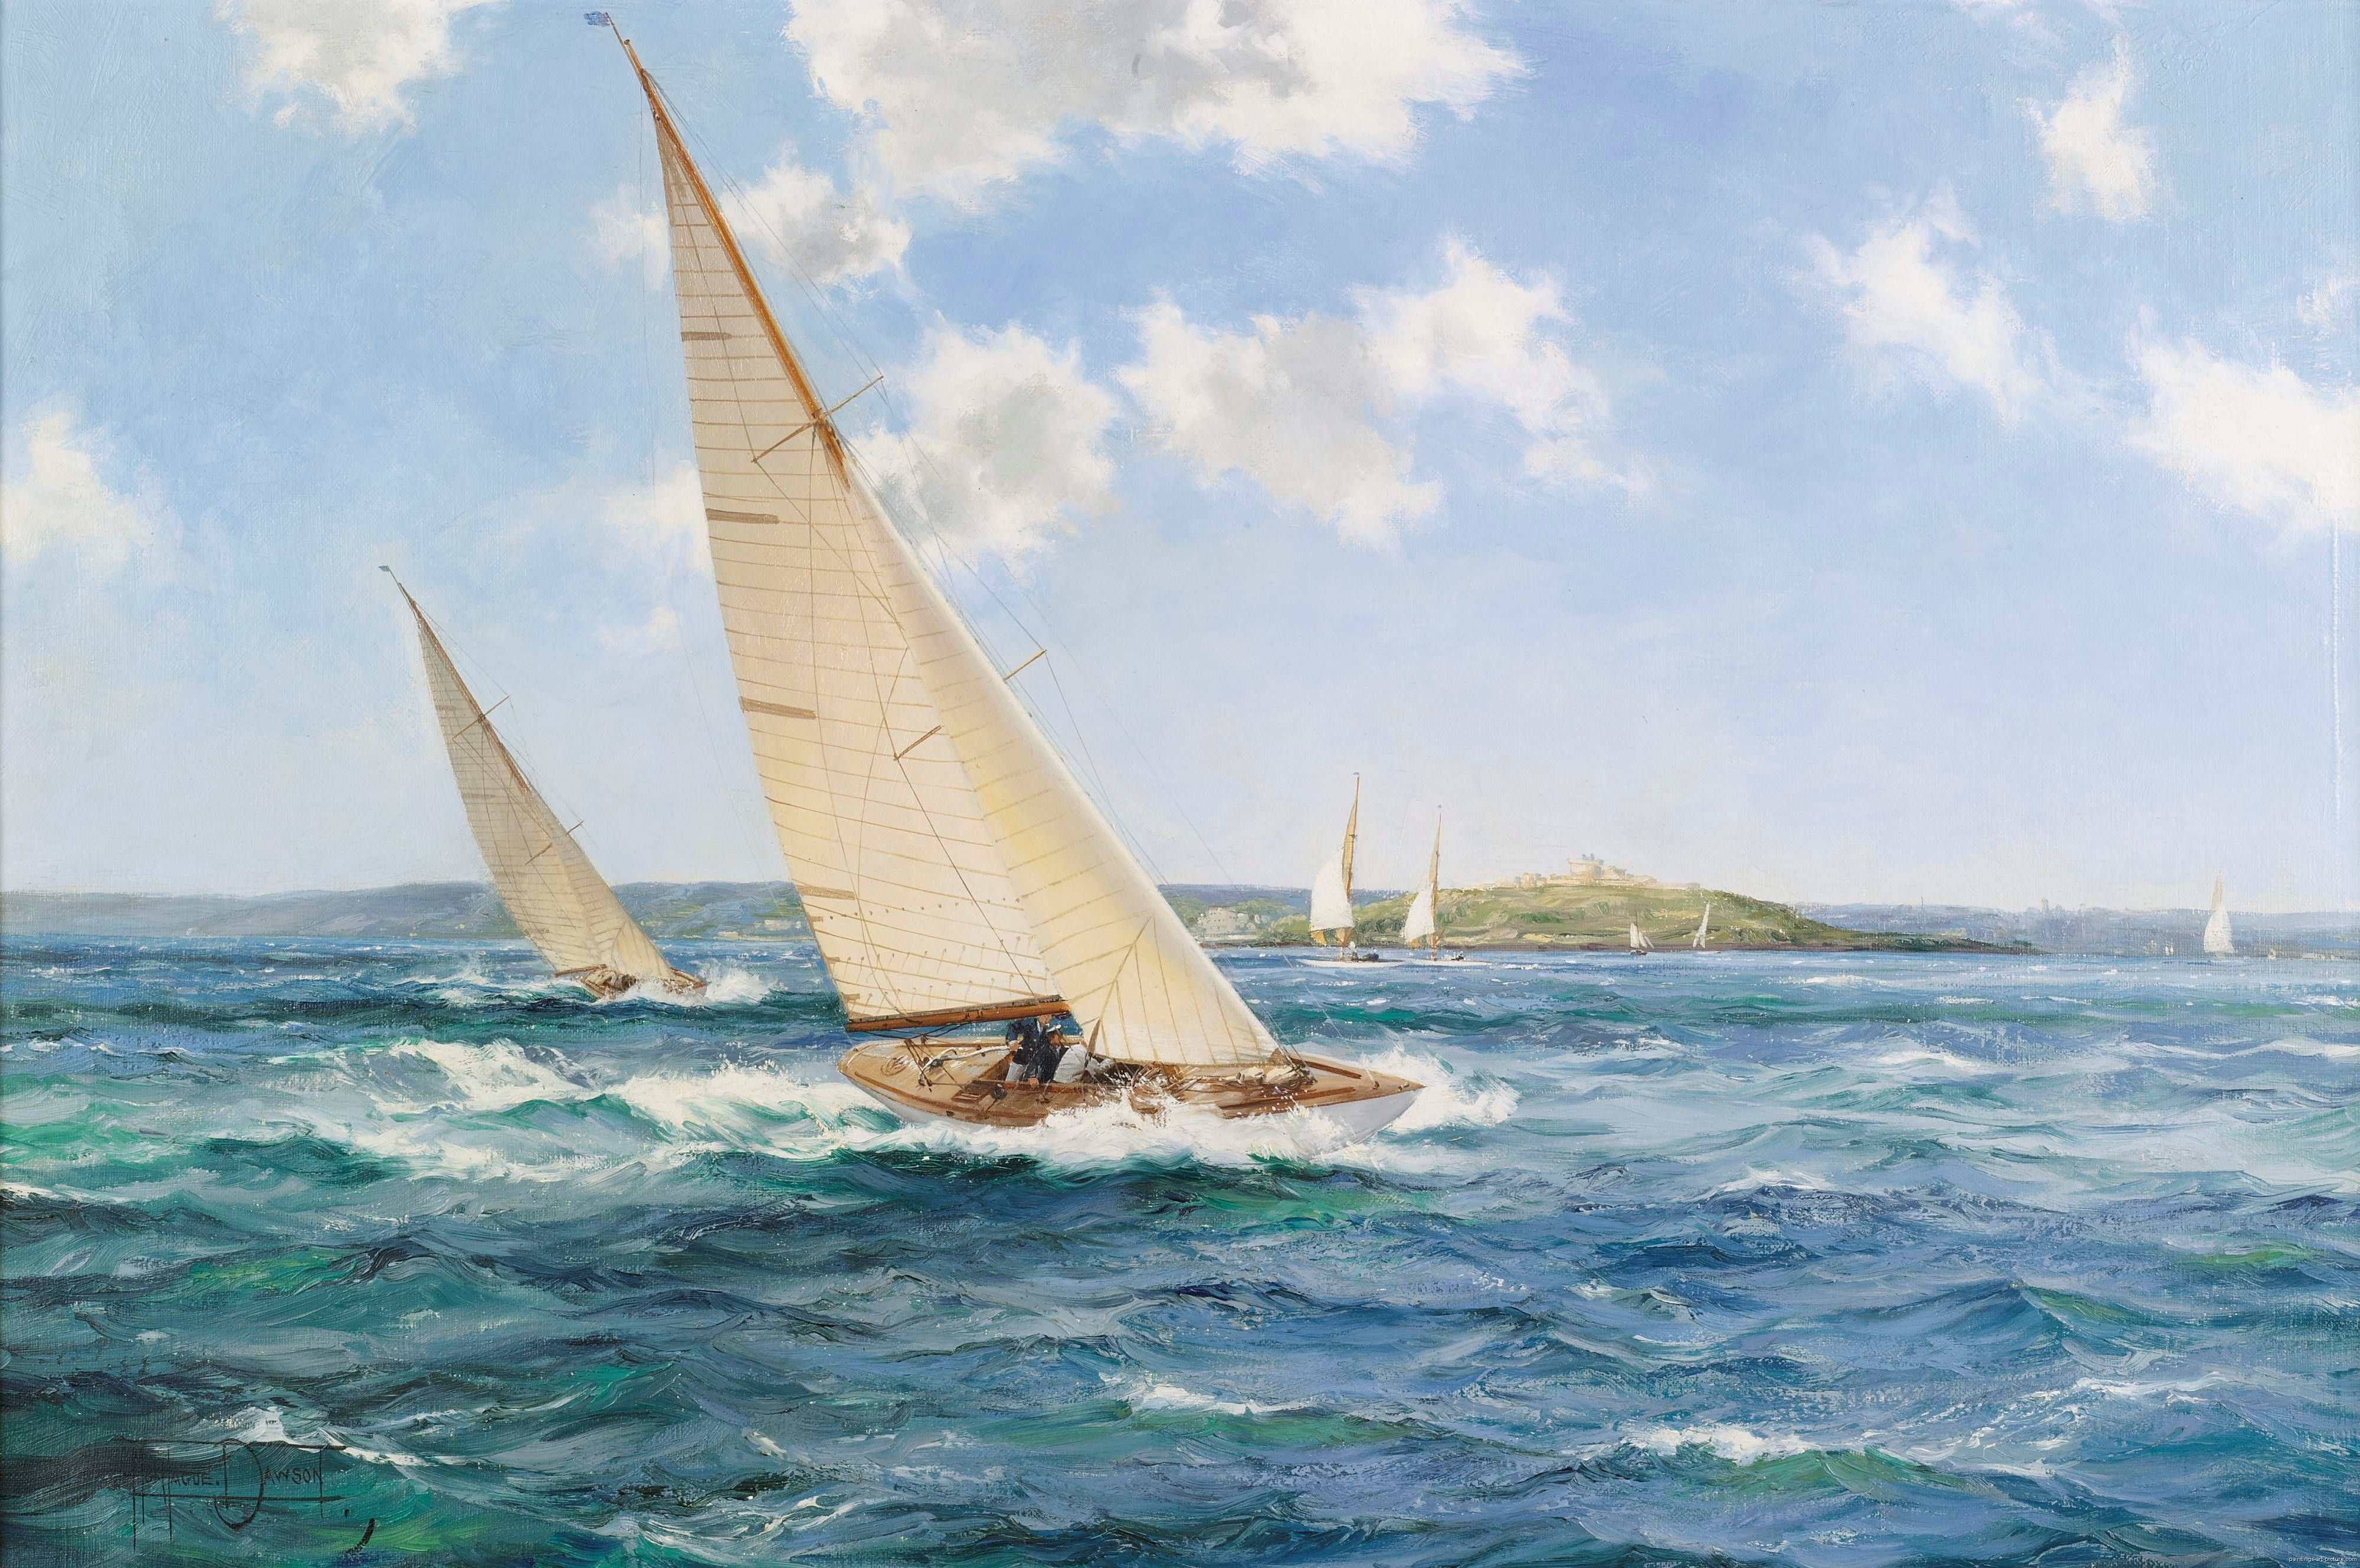 montague dawson montague dawson maritime art pinterest